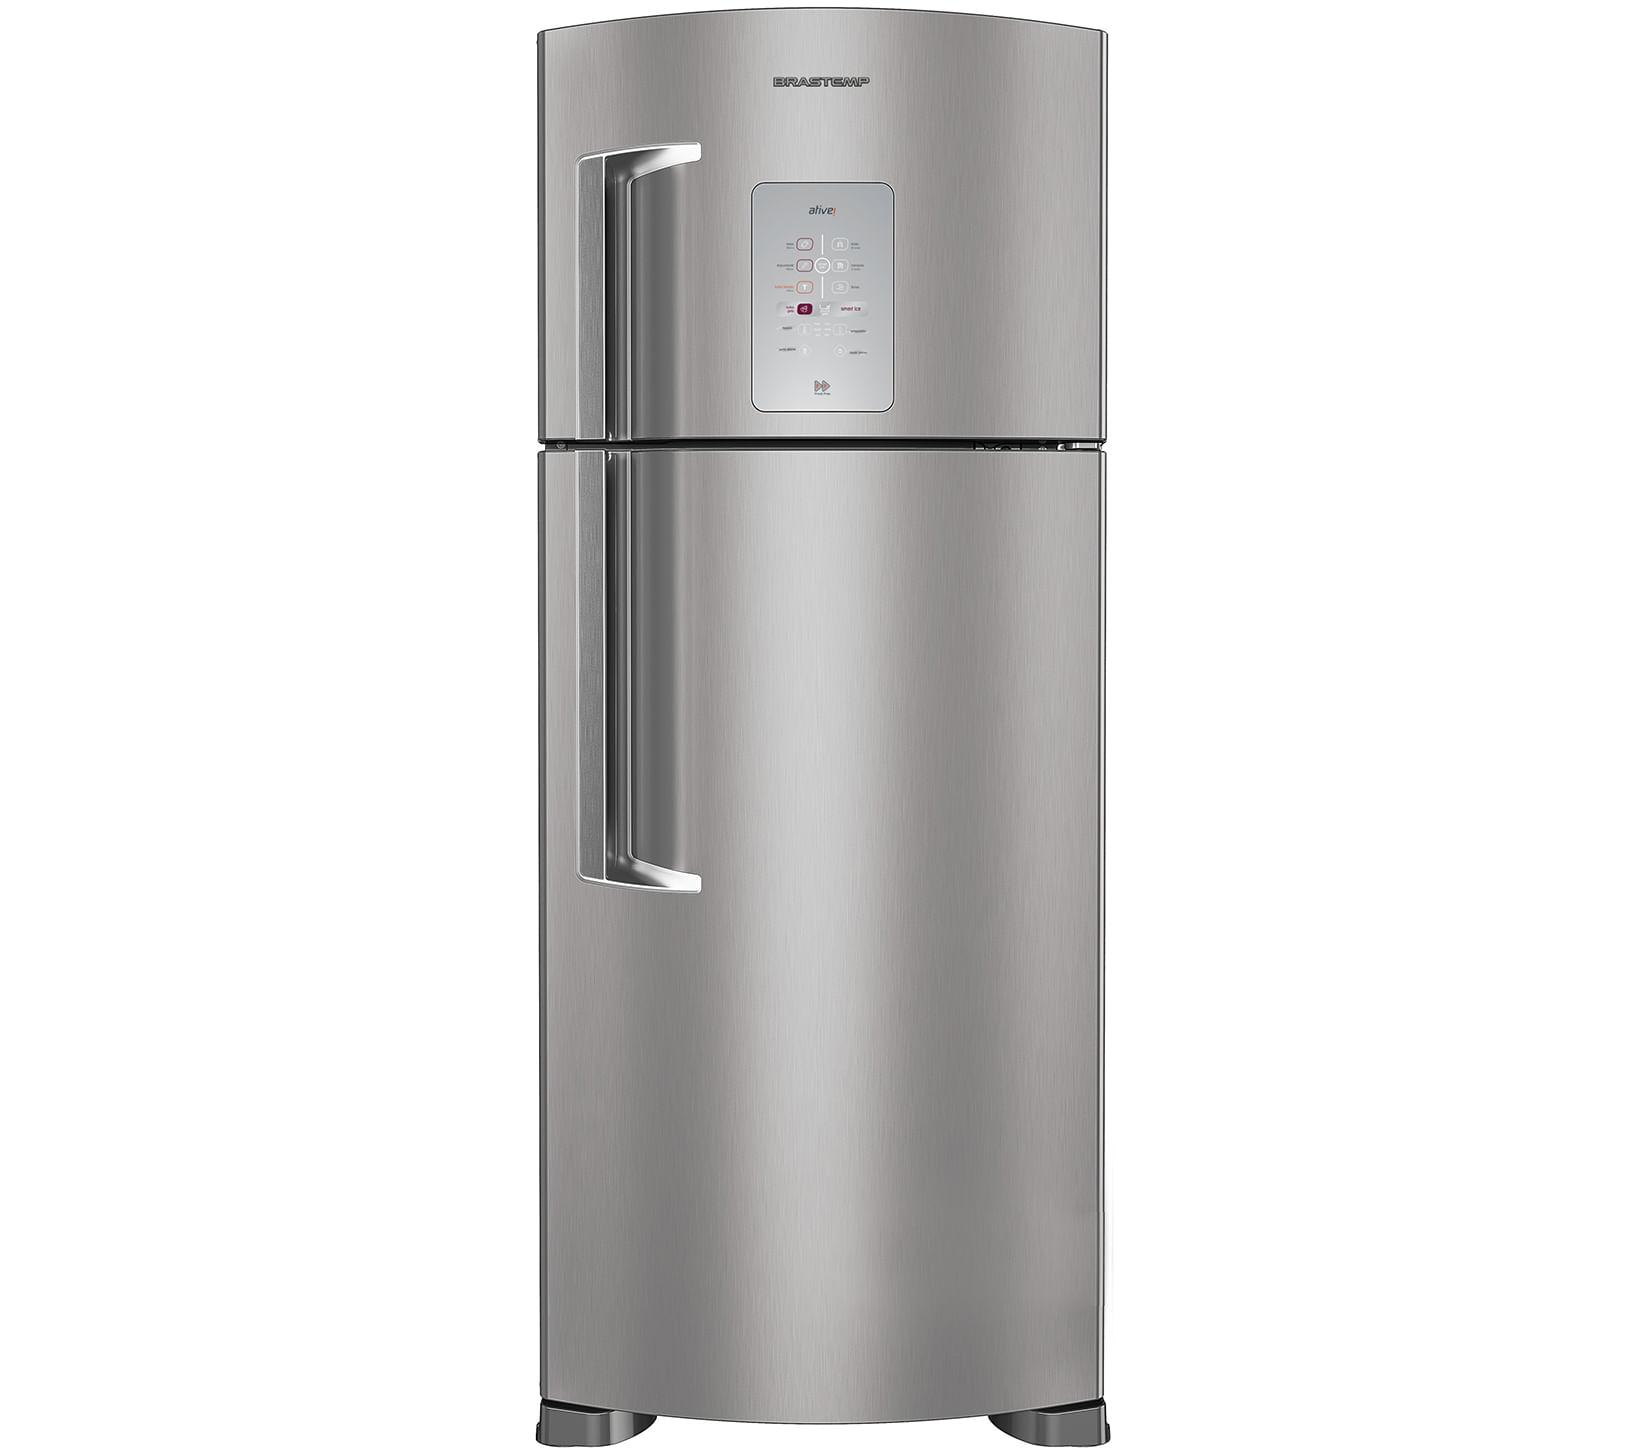 Geladeira Brastemp Frost Free Duplex 429 litros cor Inox com Smart Bar